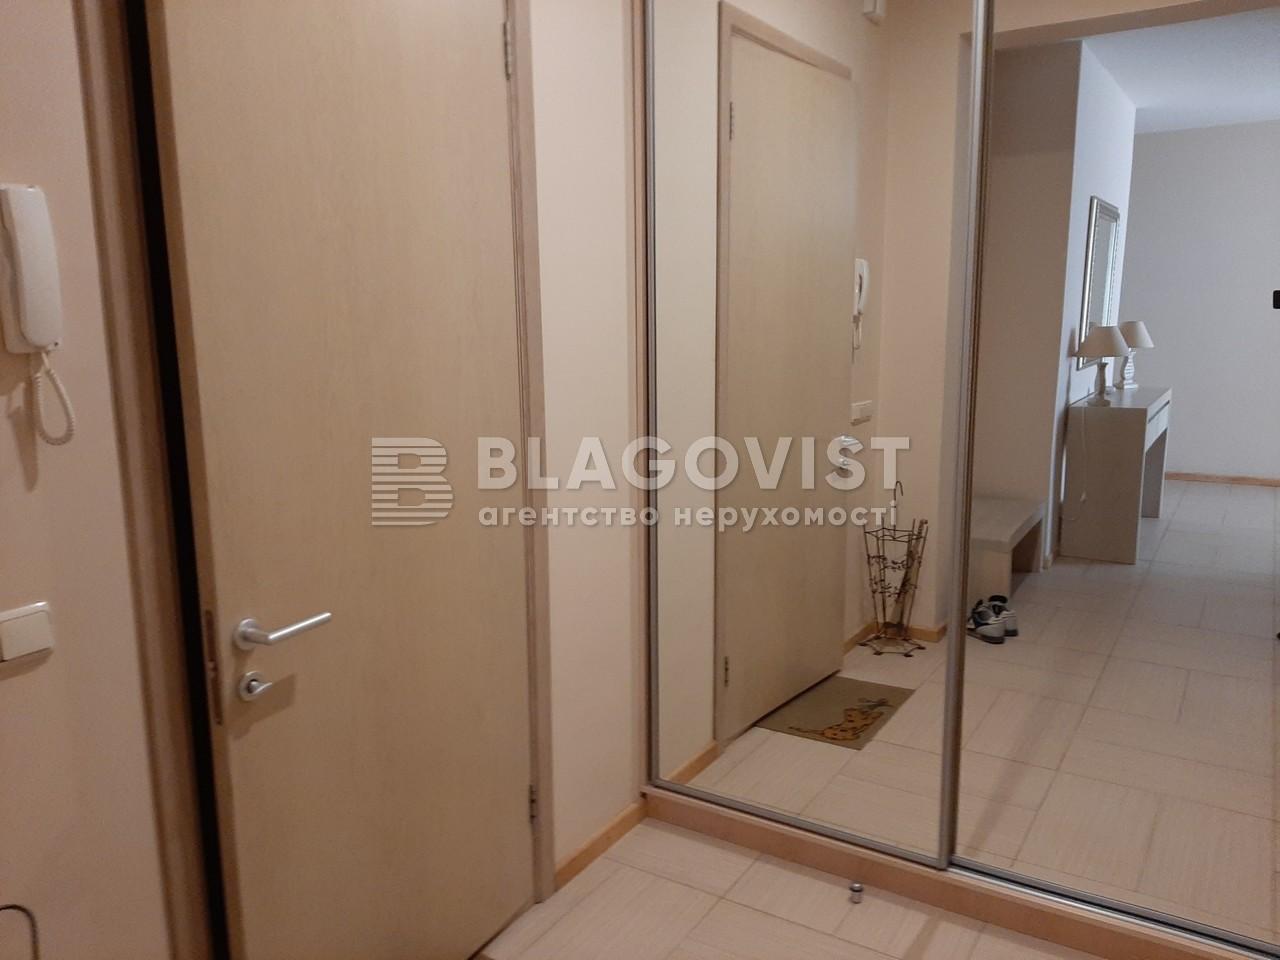 Квартира P-9079, Бутышев пер. (Иванова Андрея), 13, Киев - Фото 24